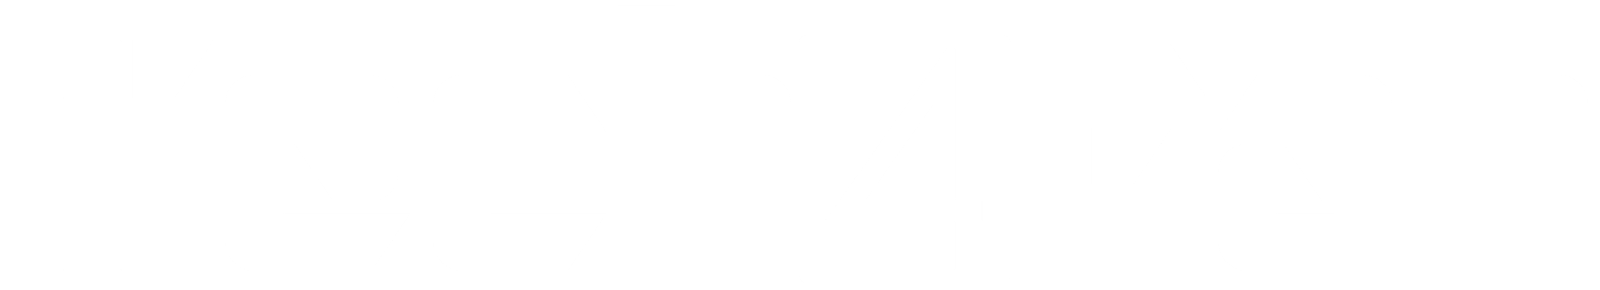 Tech4Fan - Tecnologia na medida certa